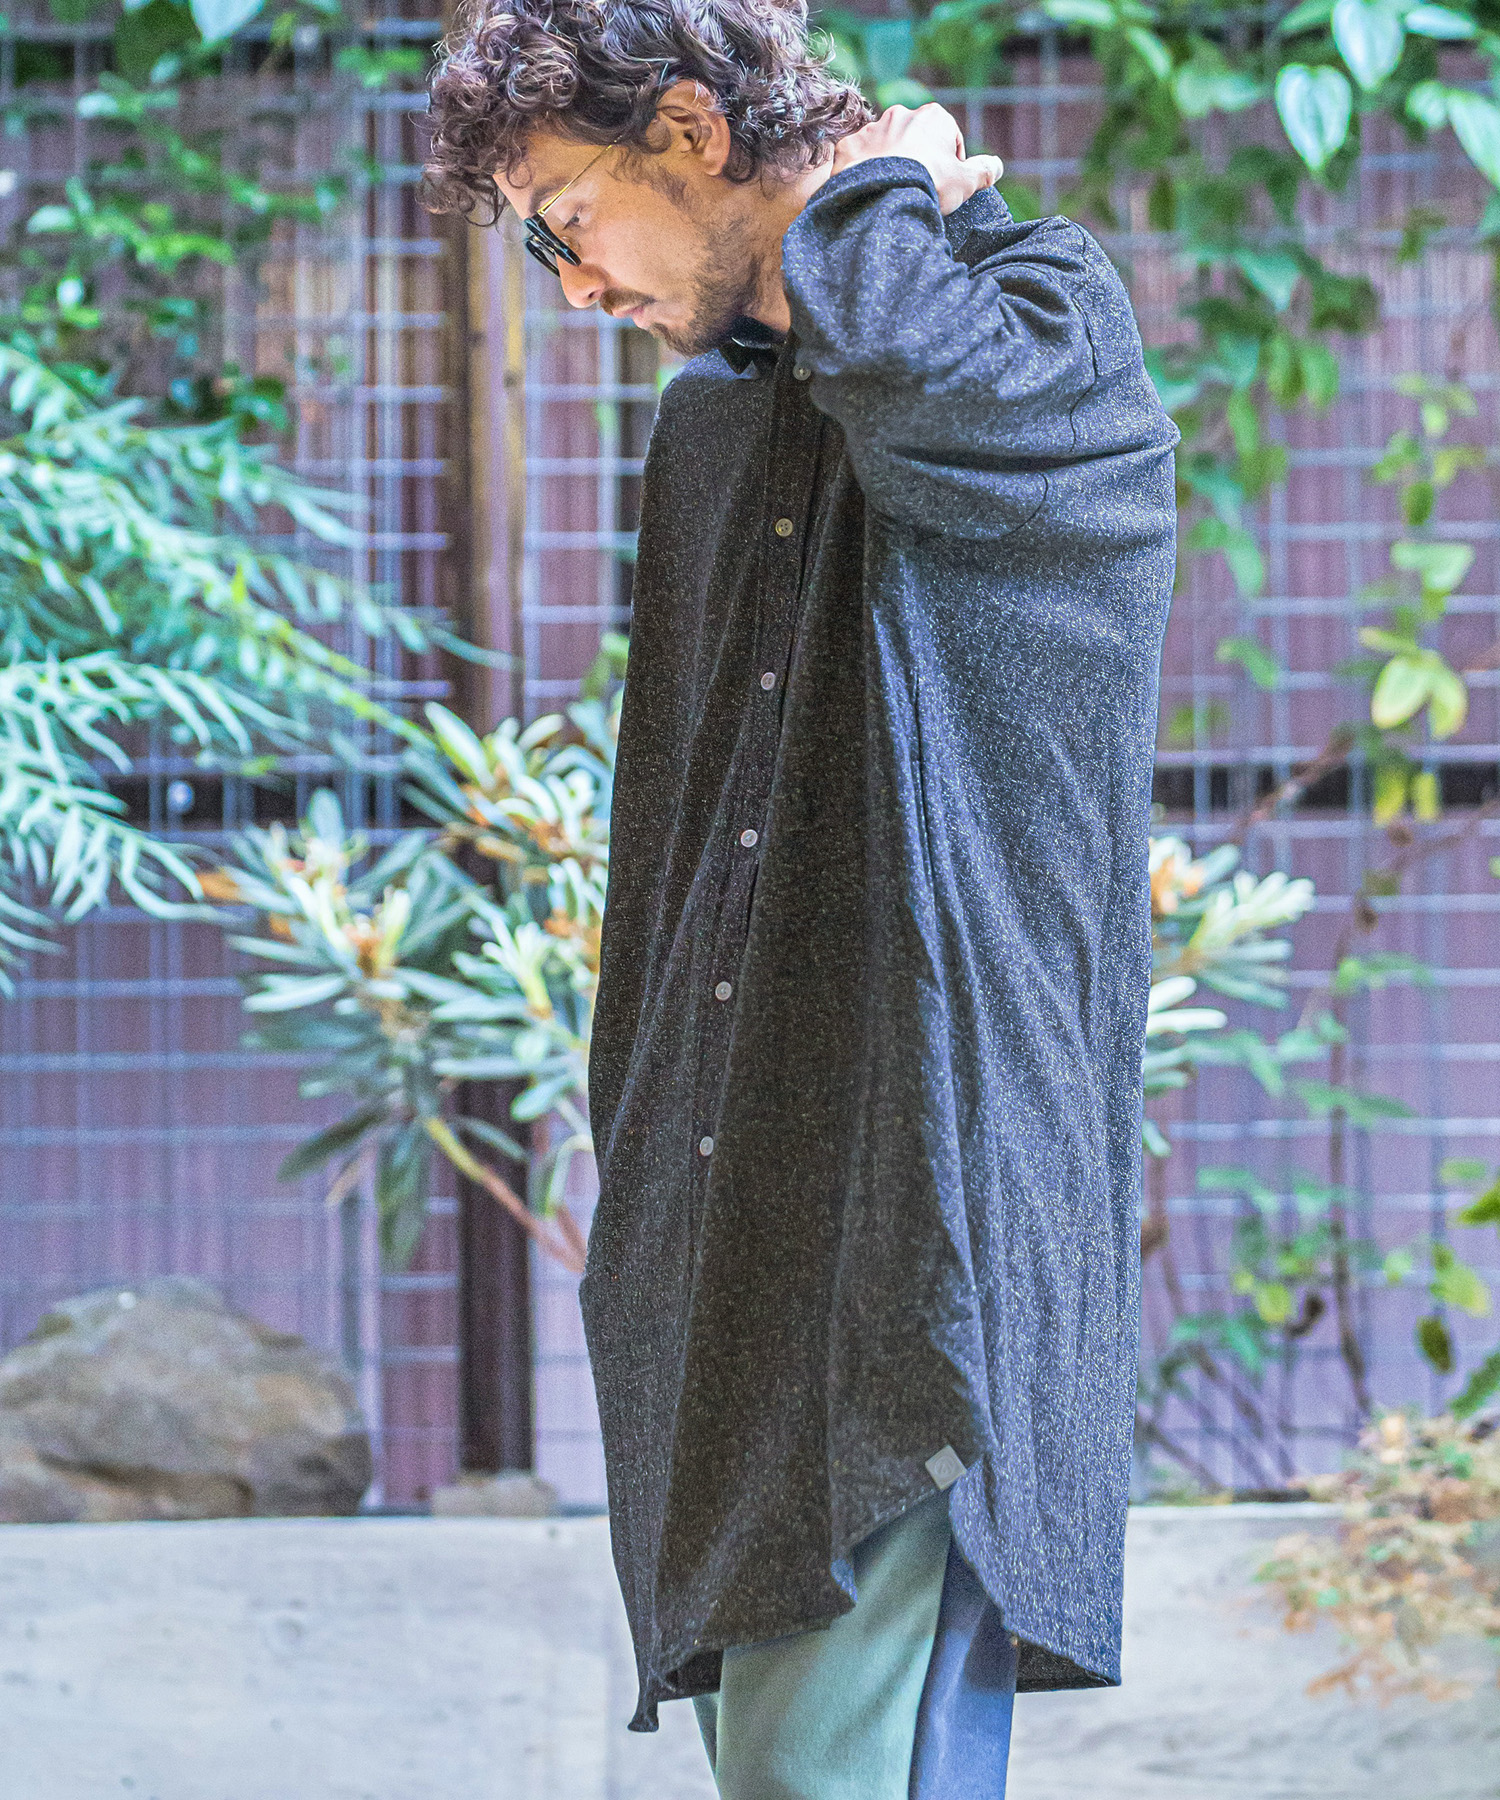 【ANGENEHM(アンゲネーム)】【予約販売9月中旬~下旬入荷】Cashmere Wool Long Length Shirts Coat(MADE IN JAPAN) コート(ANG-046)